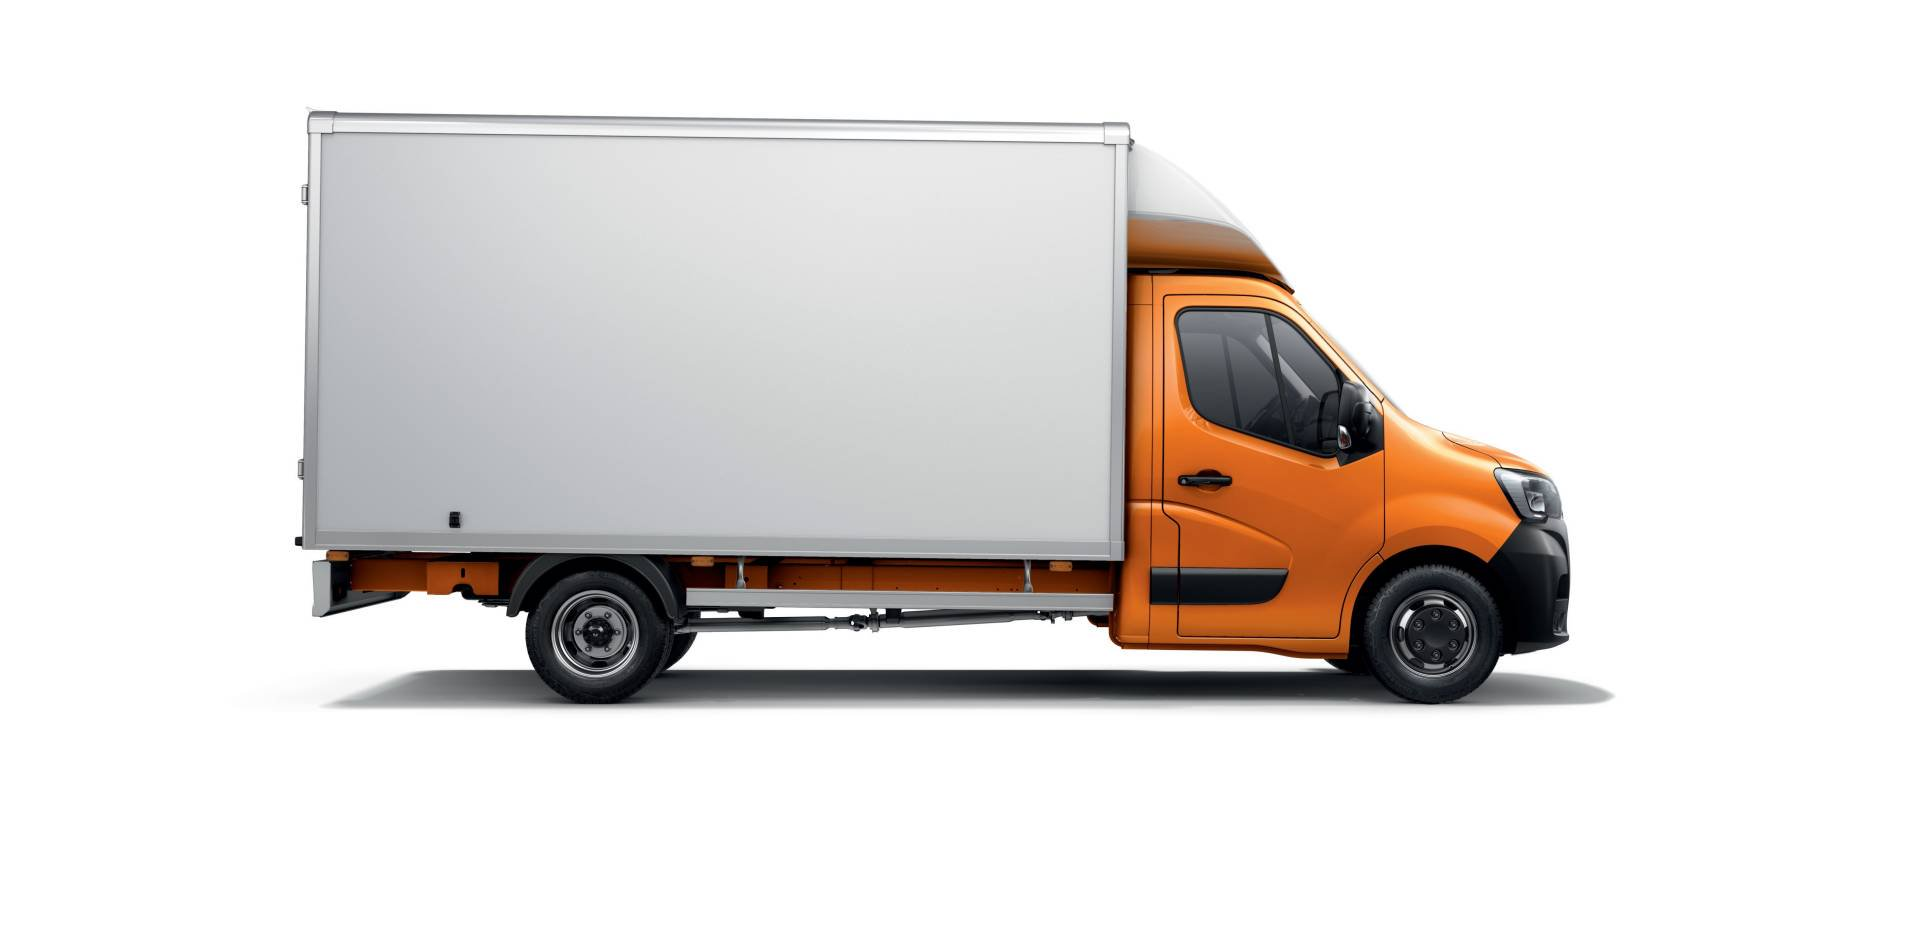 f583d991-2019my-renault-master-van-facelift-15